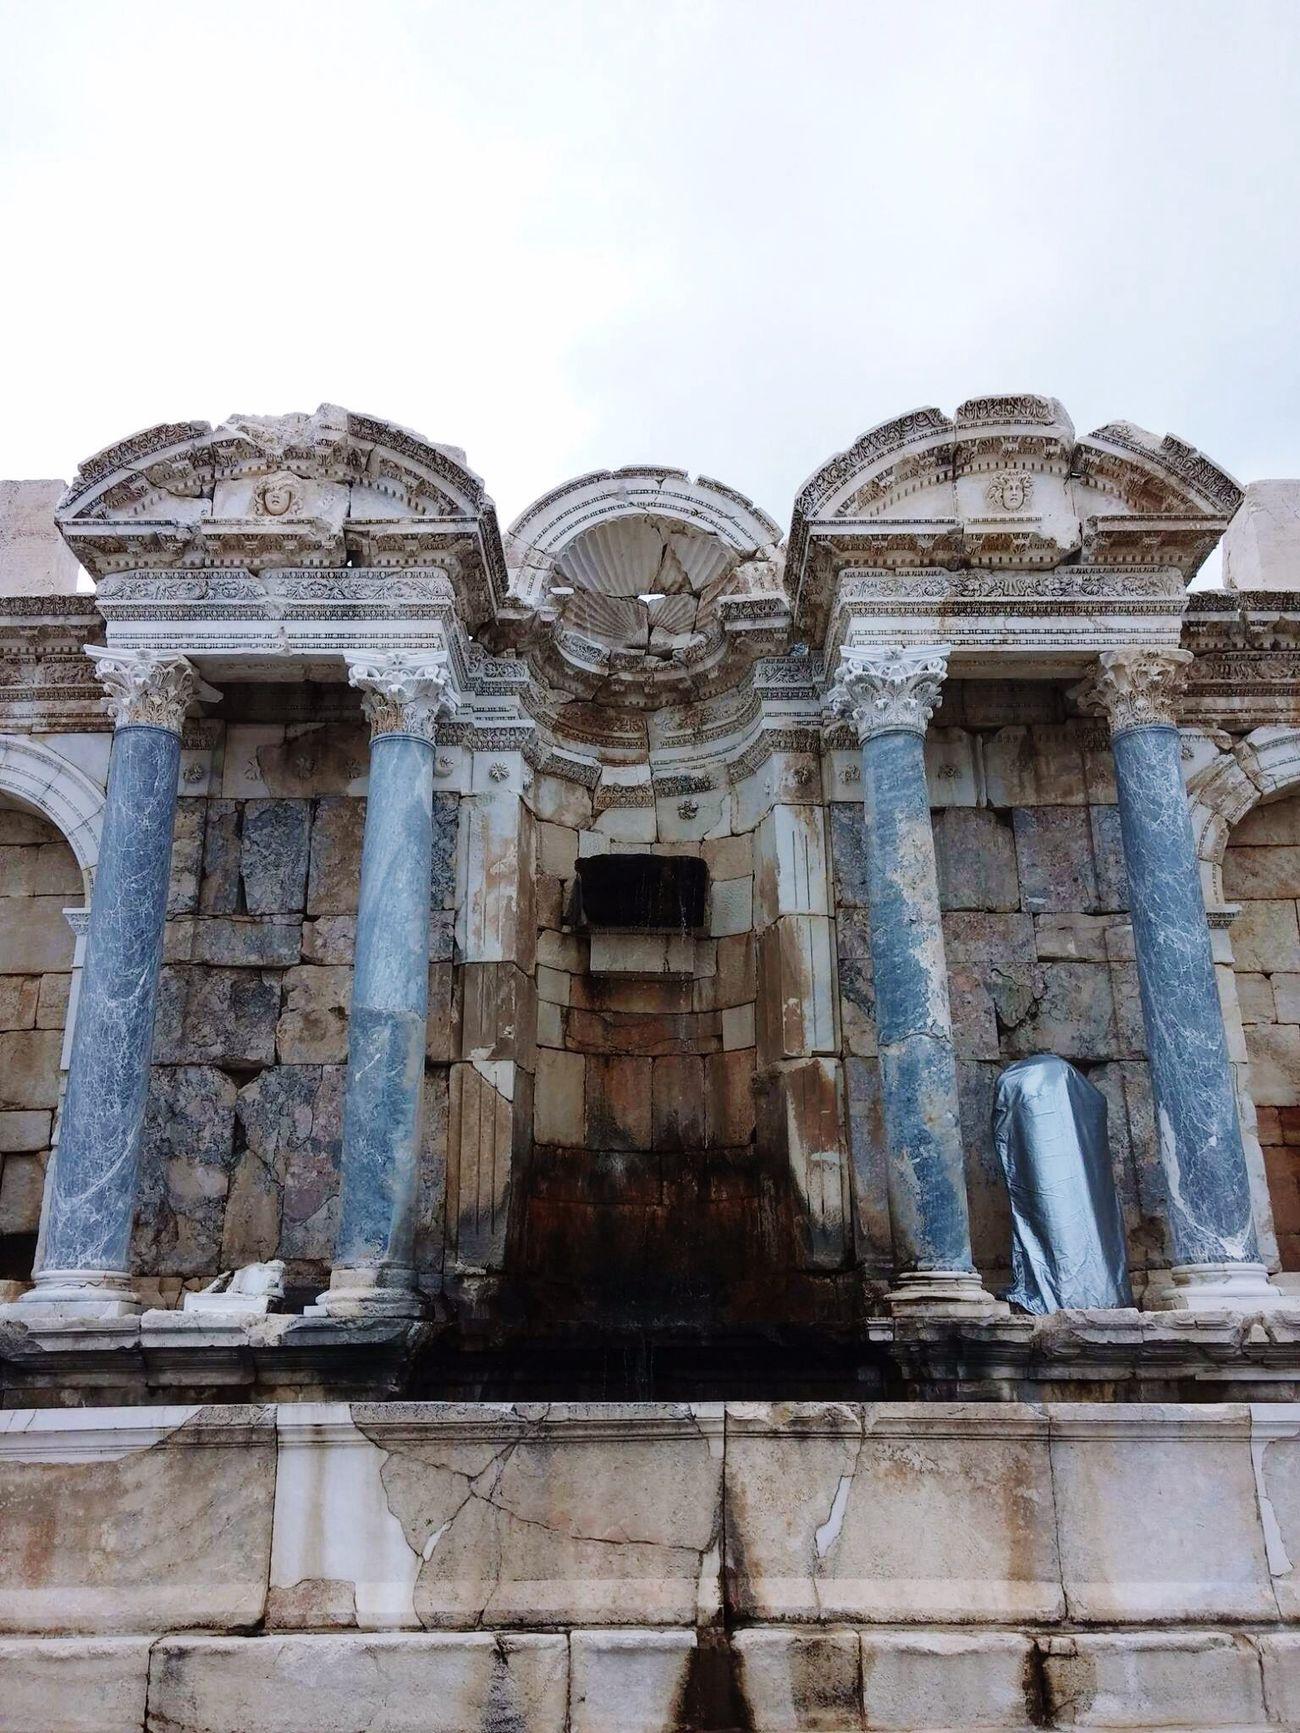 Ağlasun sagalassos antik kent antoninler Çeşmesi Historic City Hello World